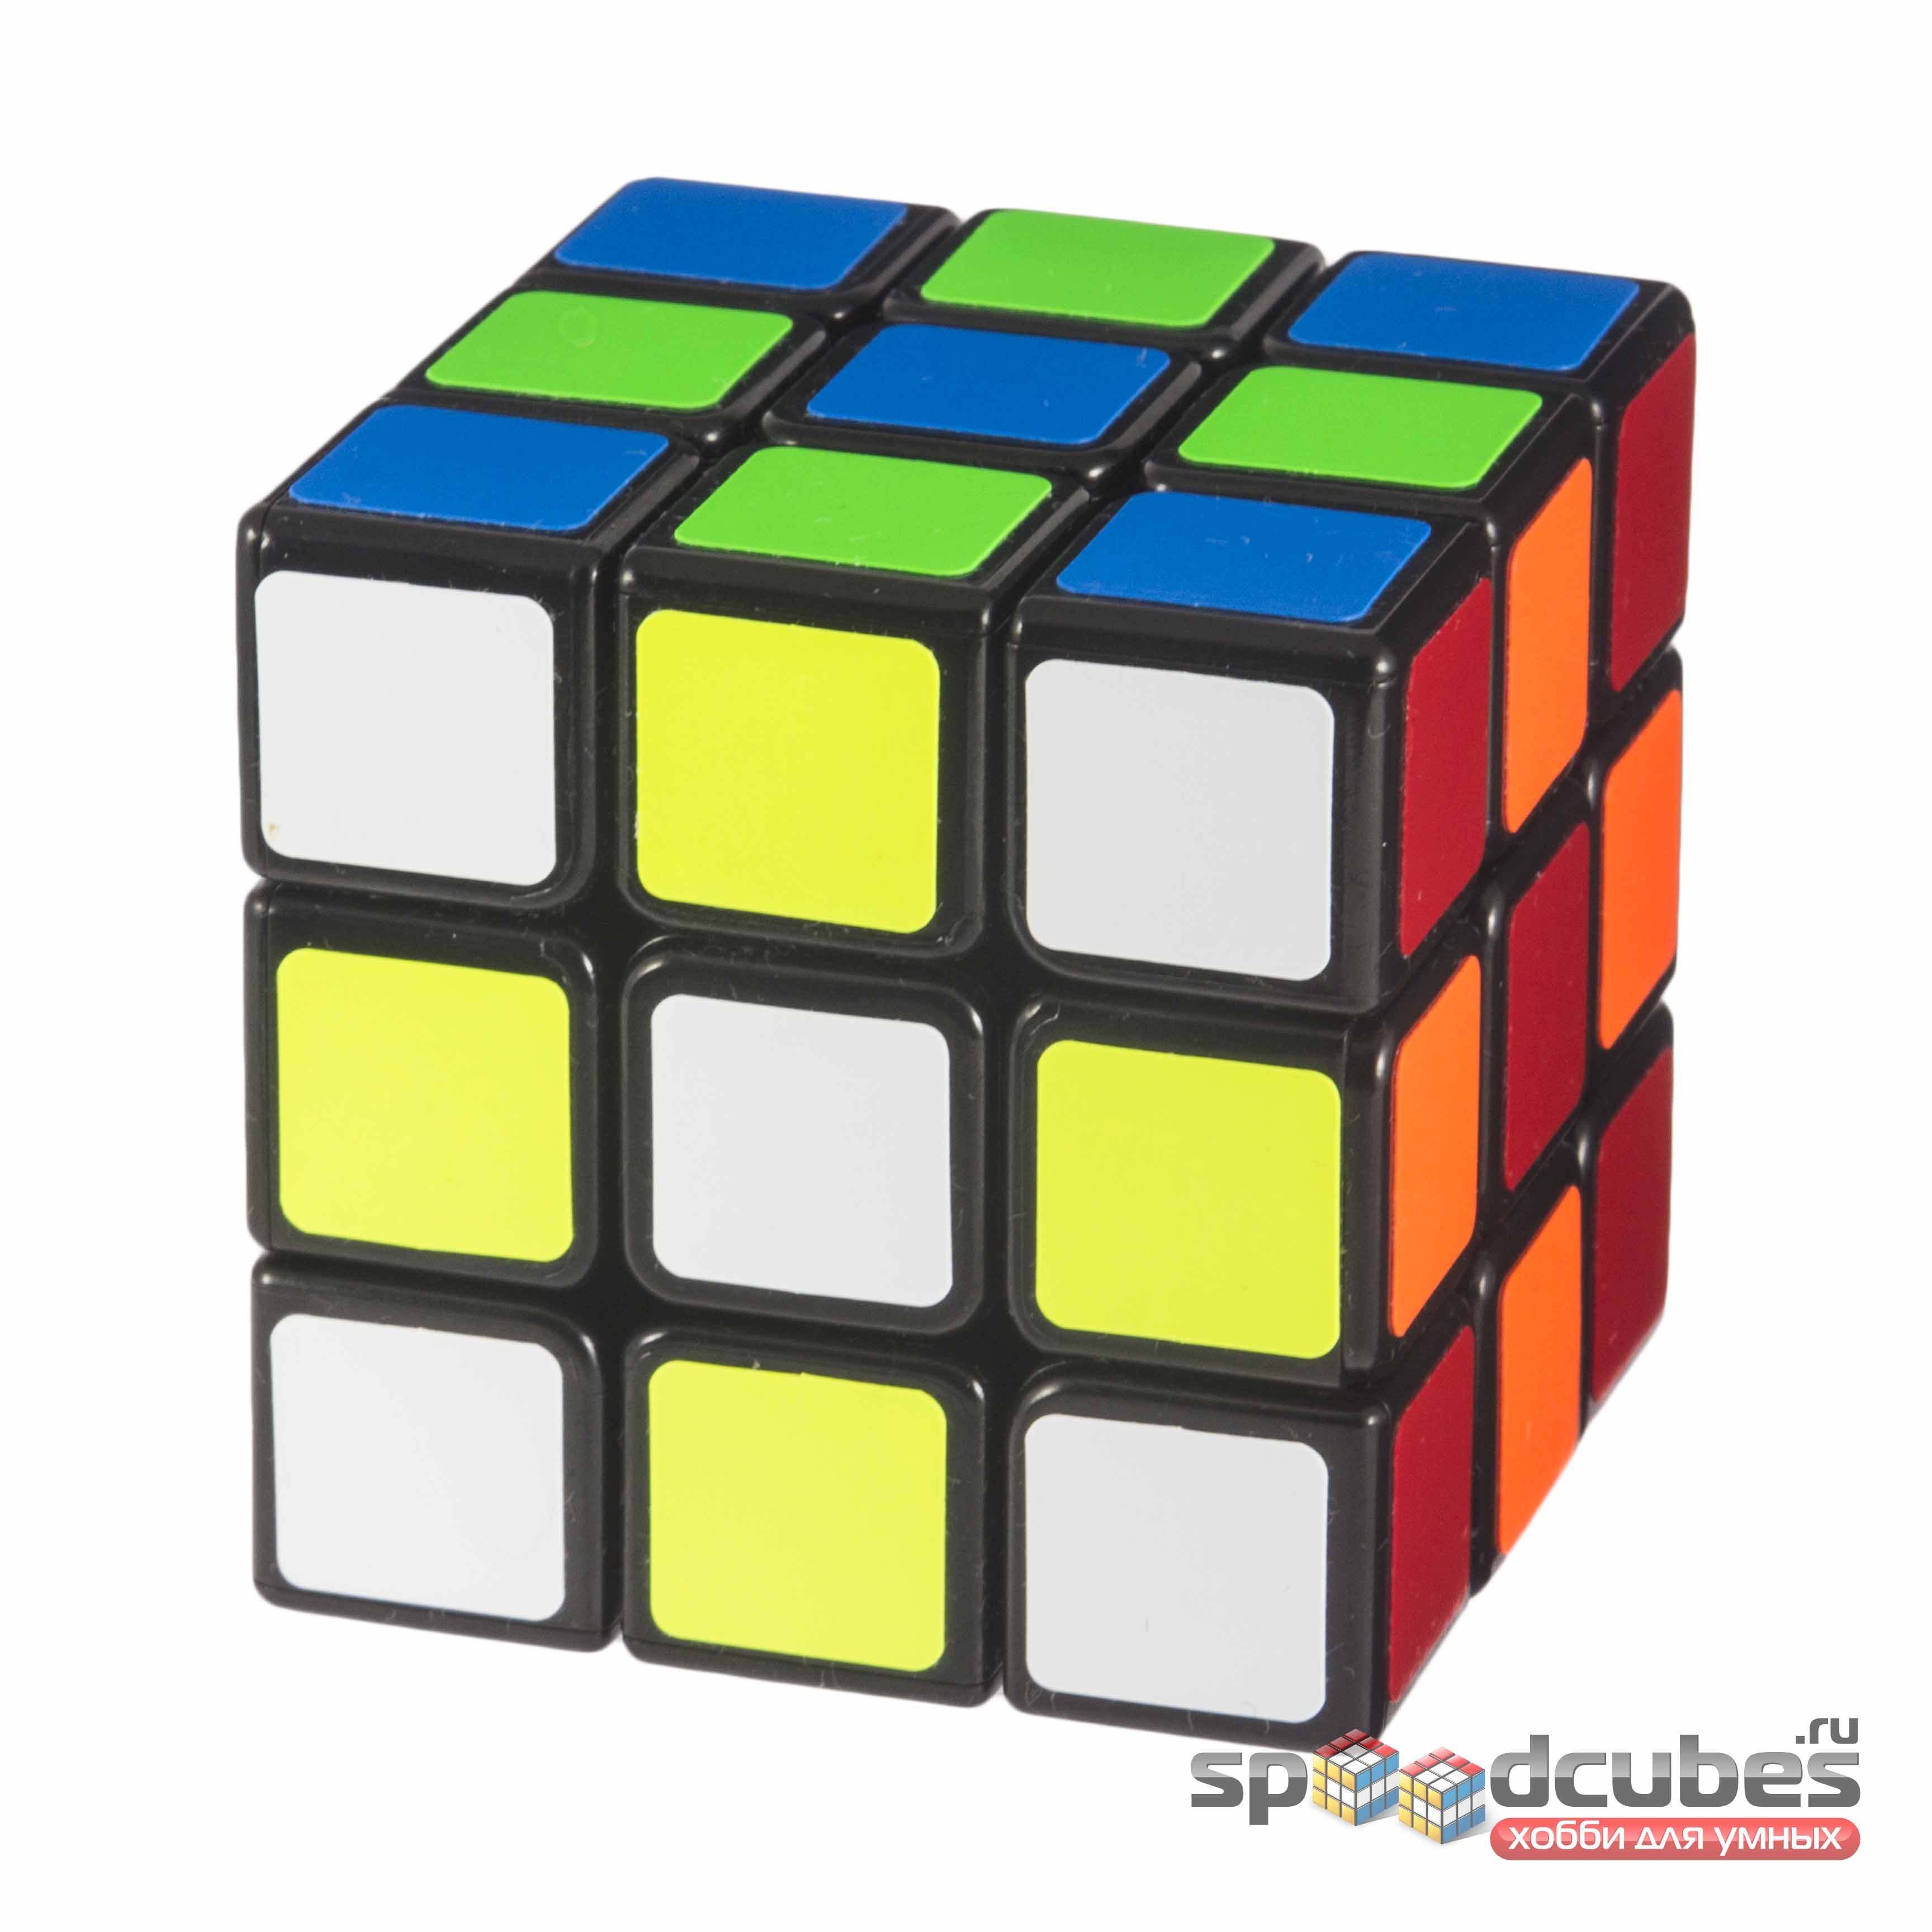 Shengshou 3x3x3 Aurora Black 3